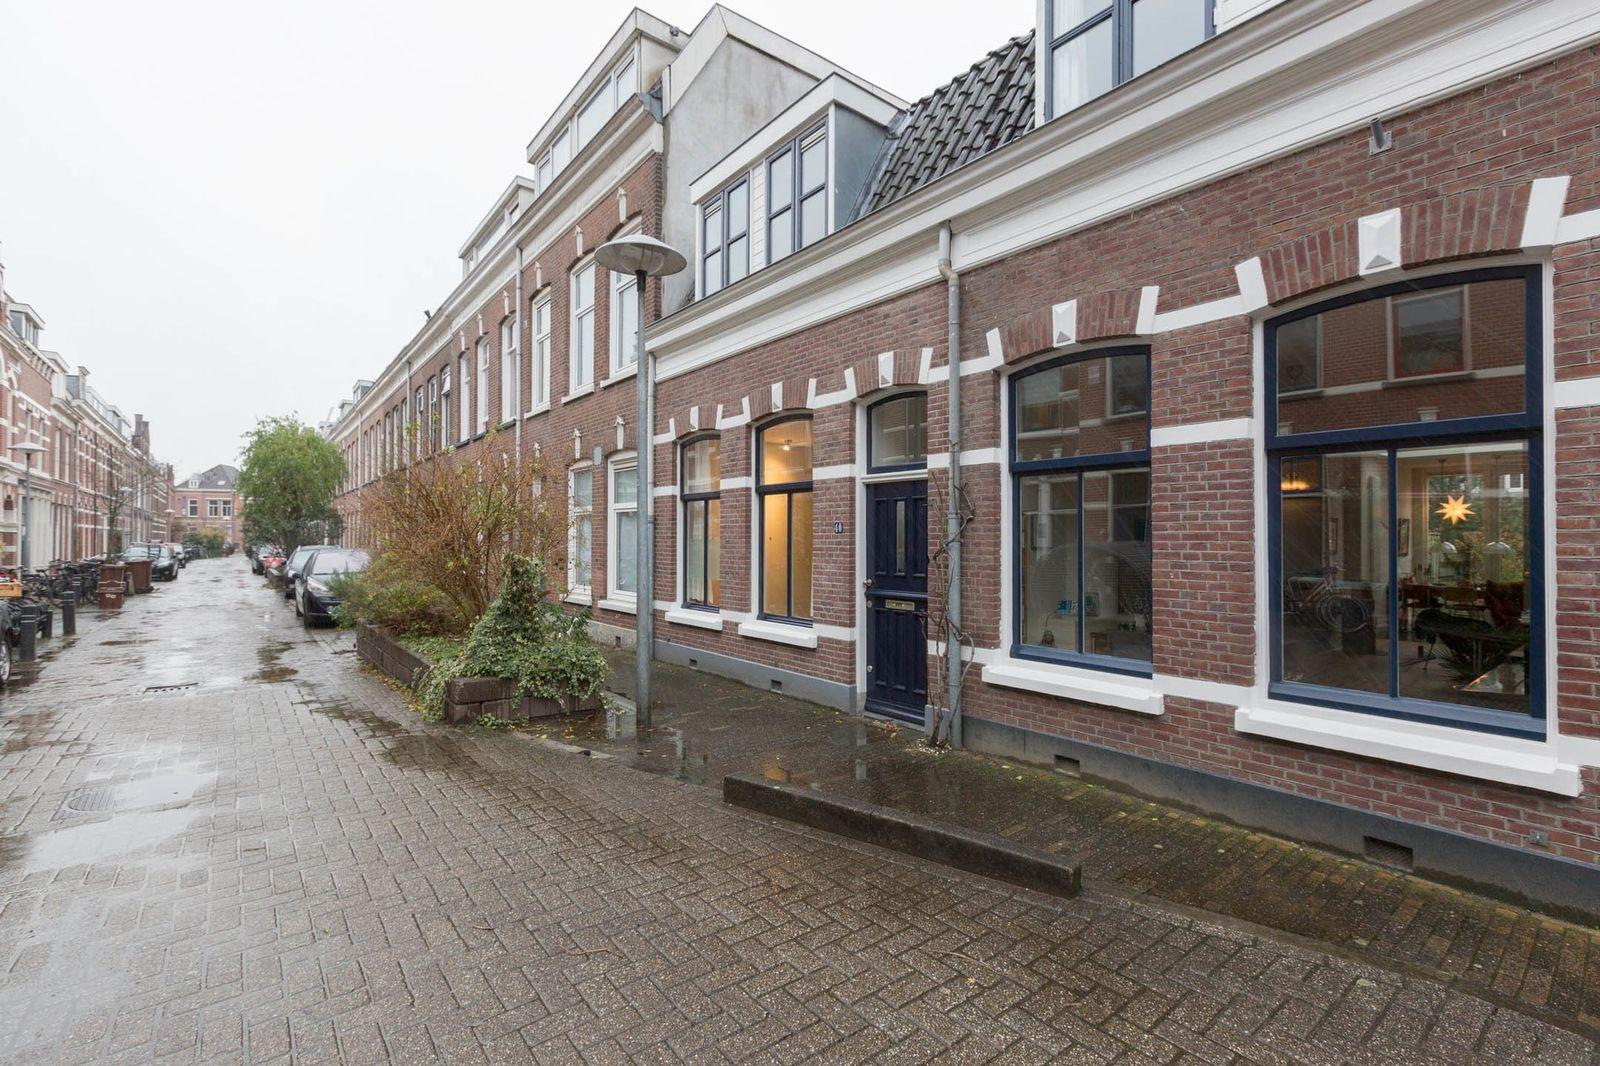 Kievitdwarsstraat 40, Utrecht